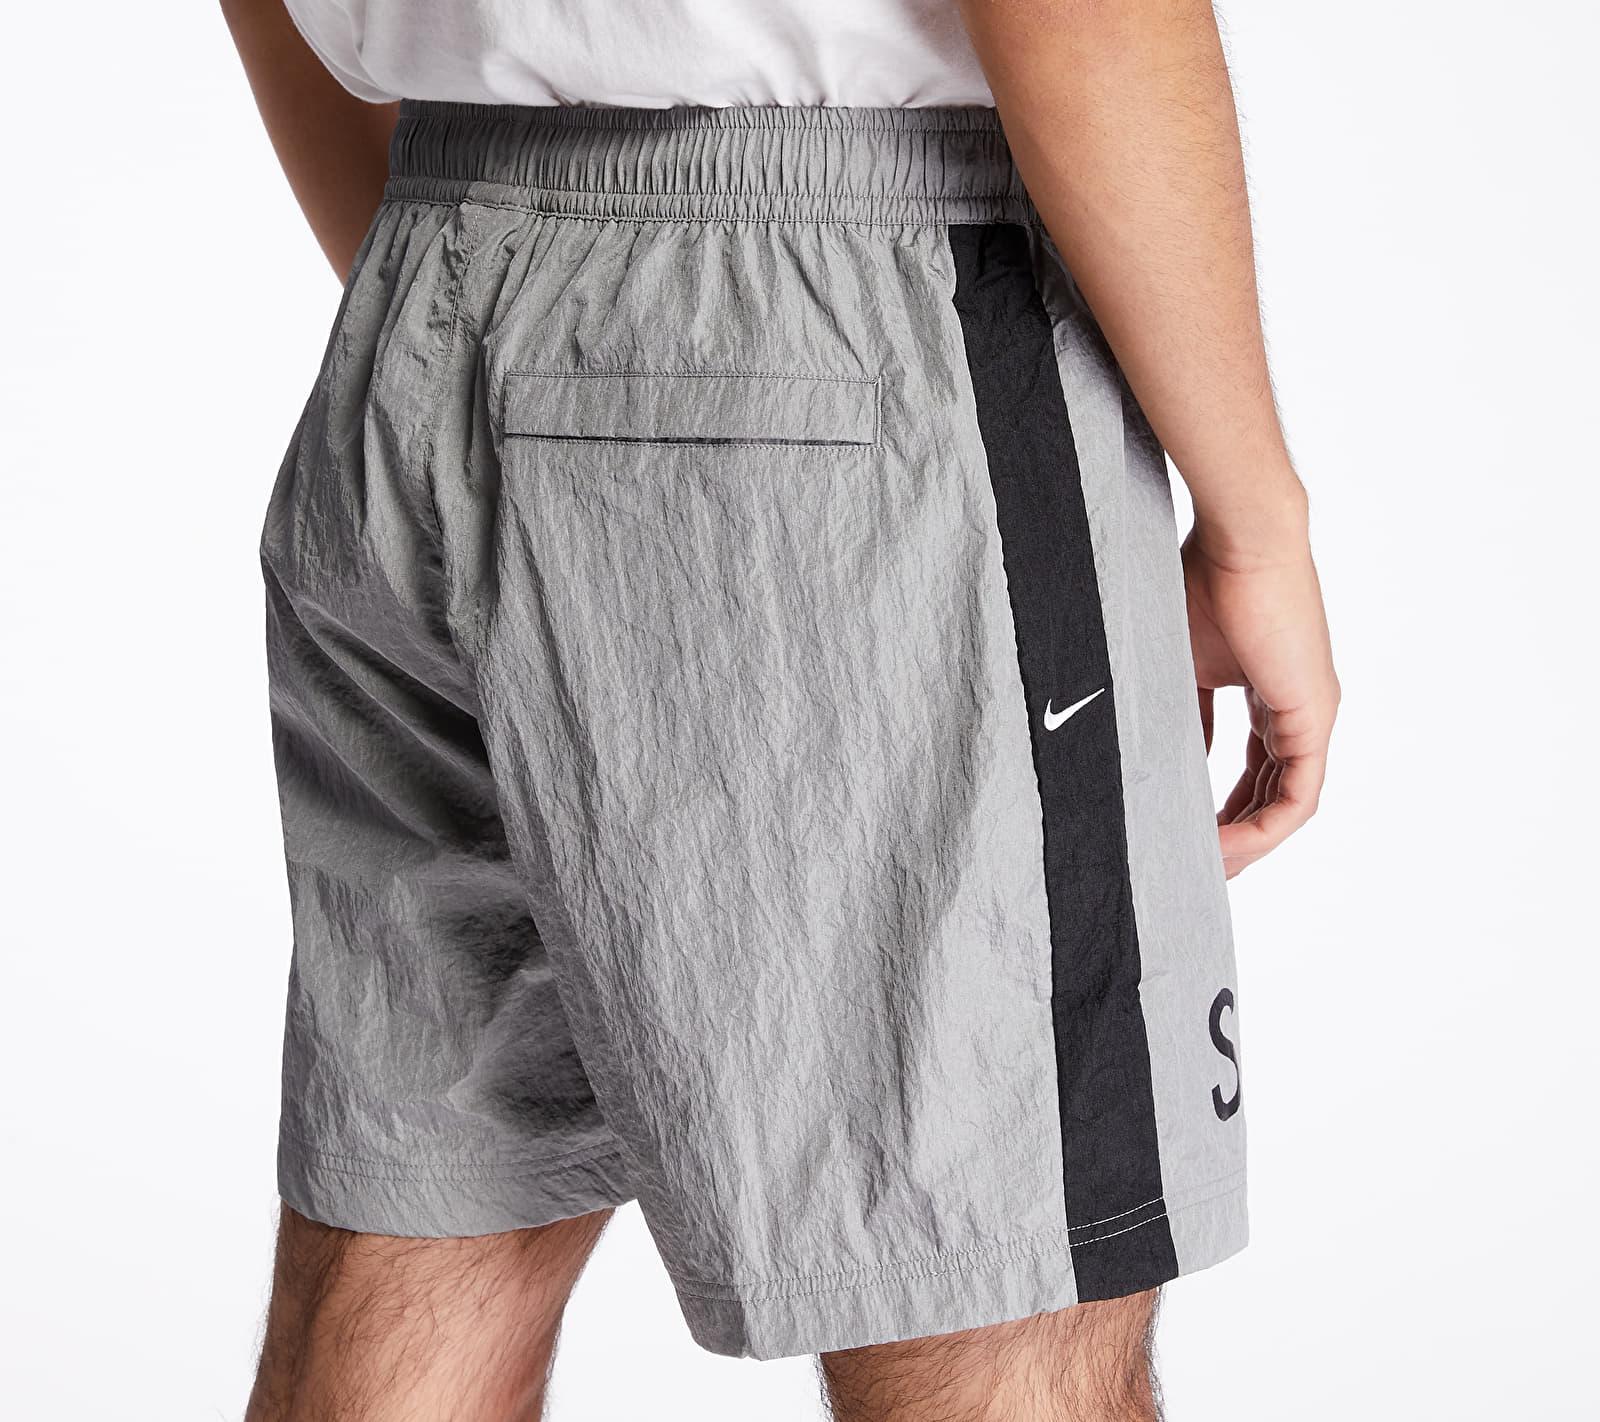 Nike Sportswear Swoosh Shorts Particle Grey/ Black/ White/ White, Gray